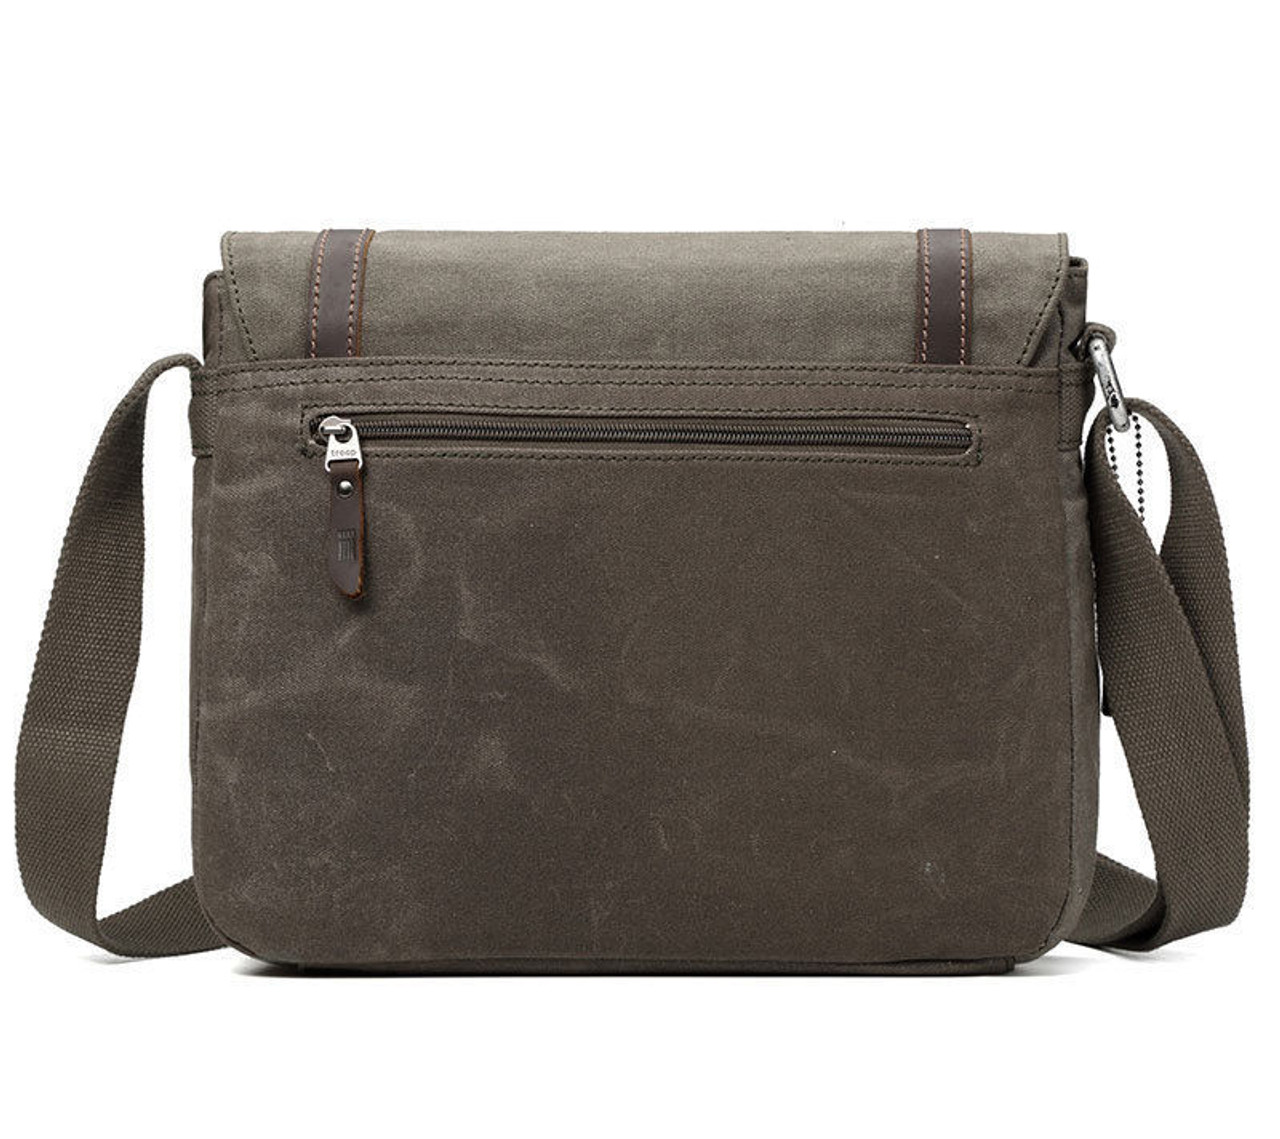 cd2cb5147163 Troop Heritage Canvas Leather Brown Messenger Bag